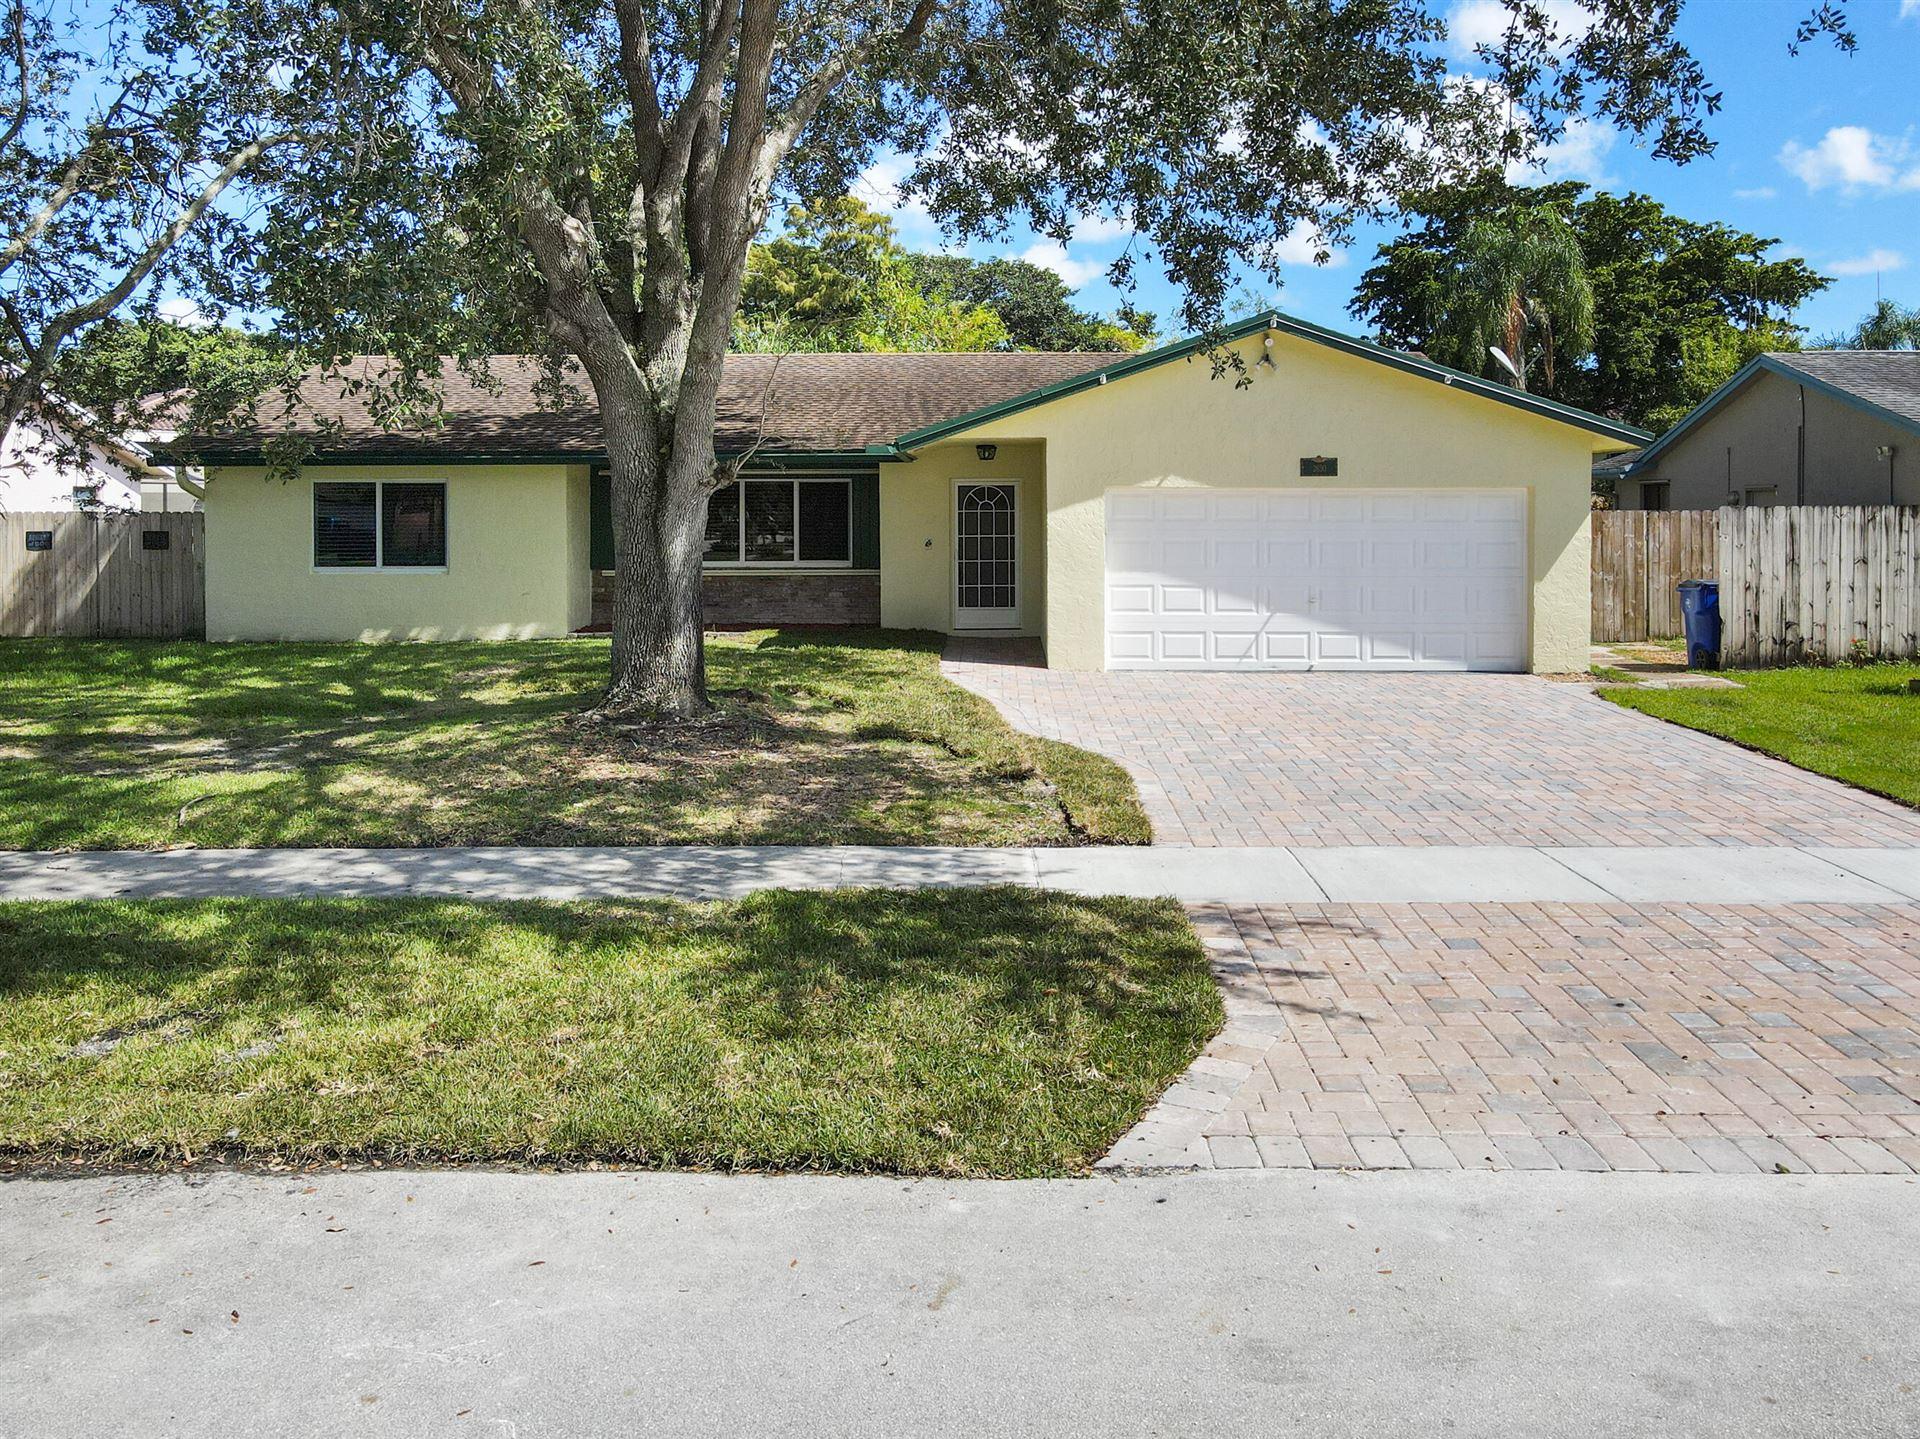 2630 NW 51st Terrace, Margate, FL 33063 - MLS#: RX-10752201